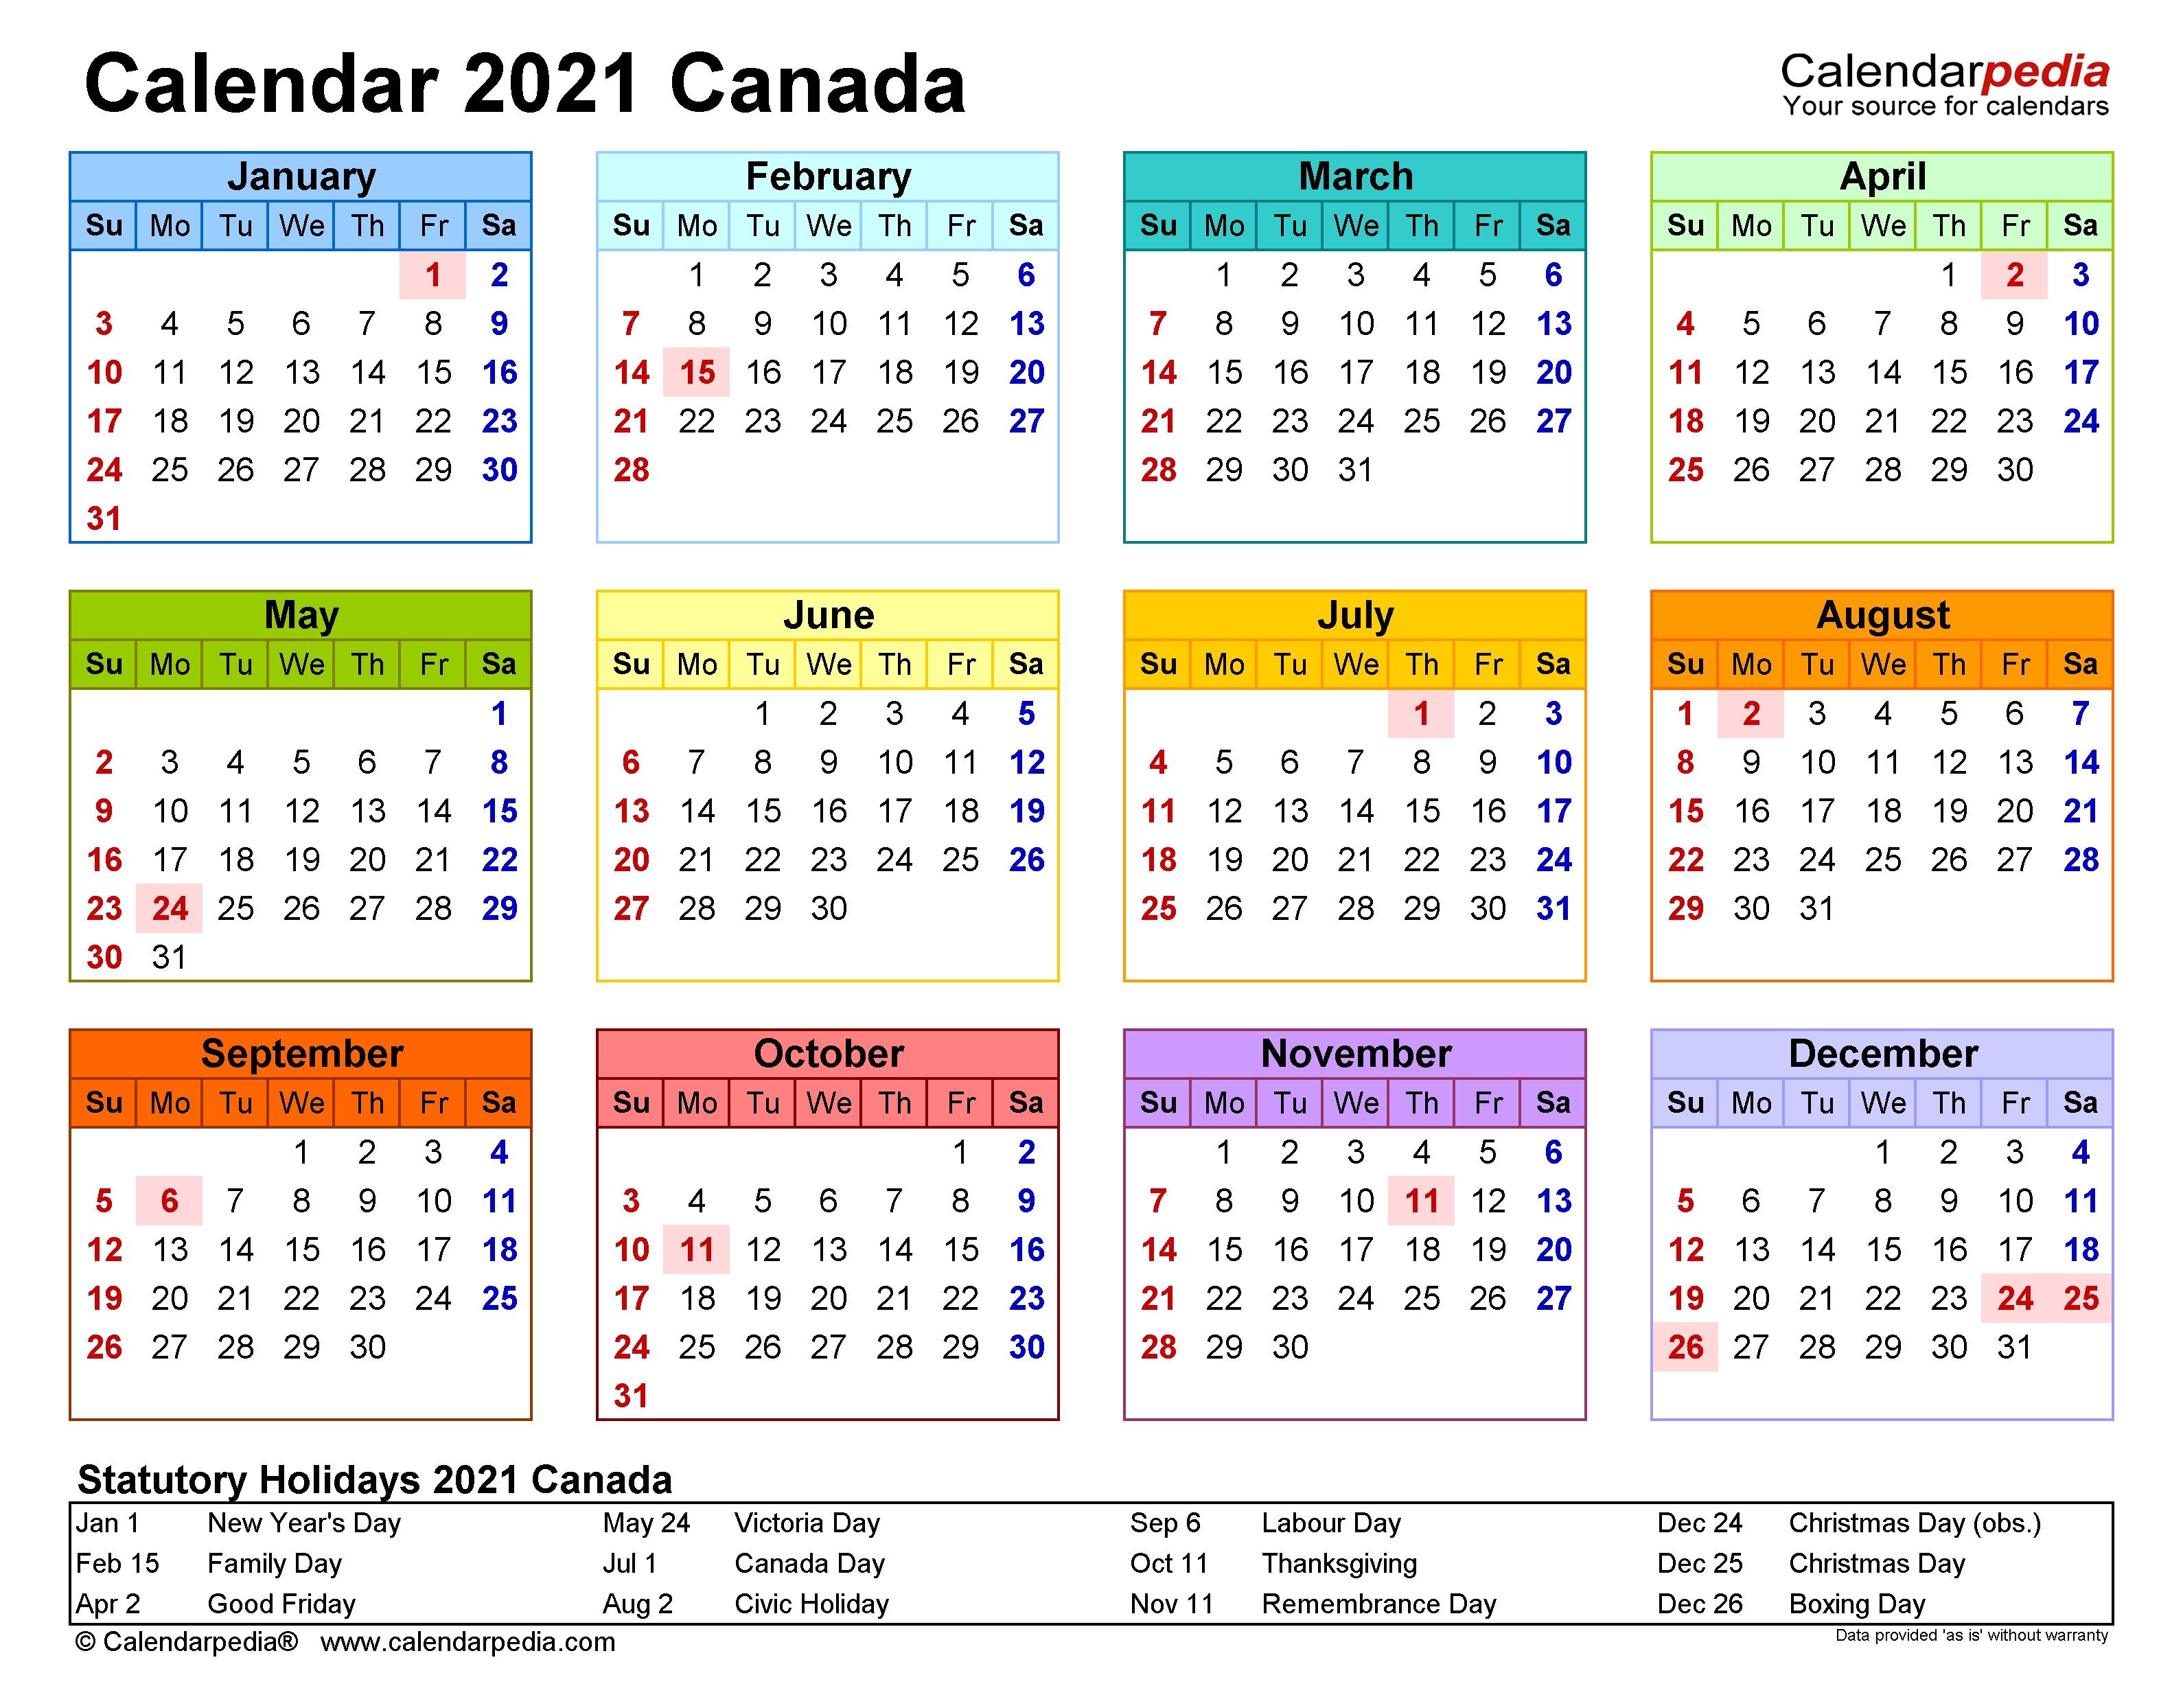 Canada Calendar 2021 - Free Printable Excel Templates  Excel 4 Month 2021 Calendar Template